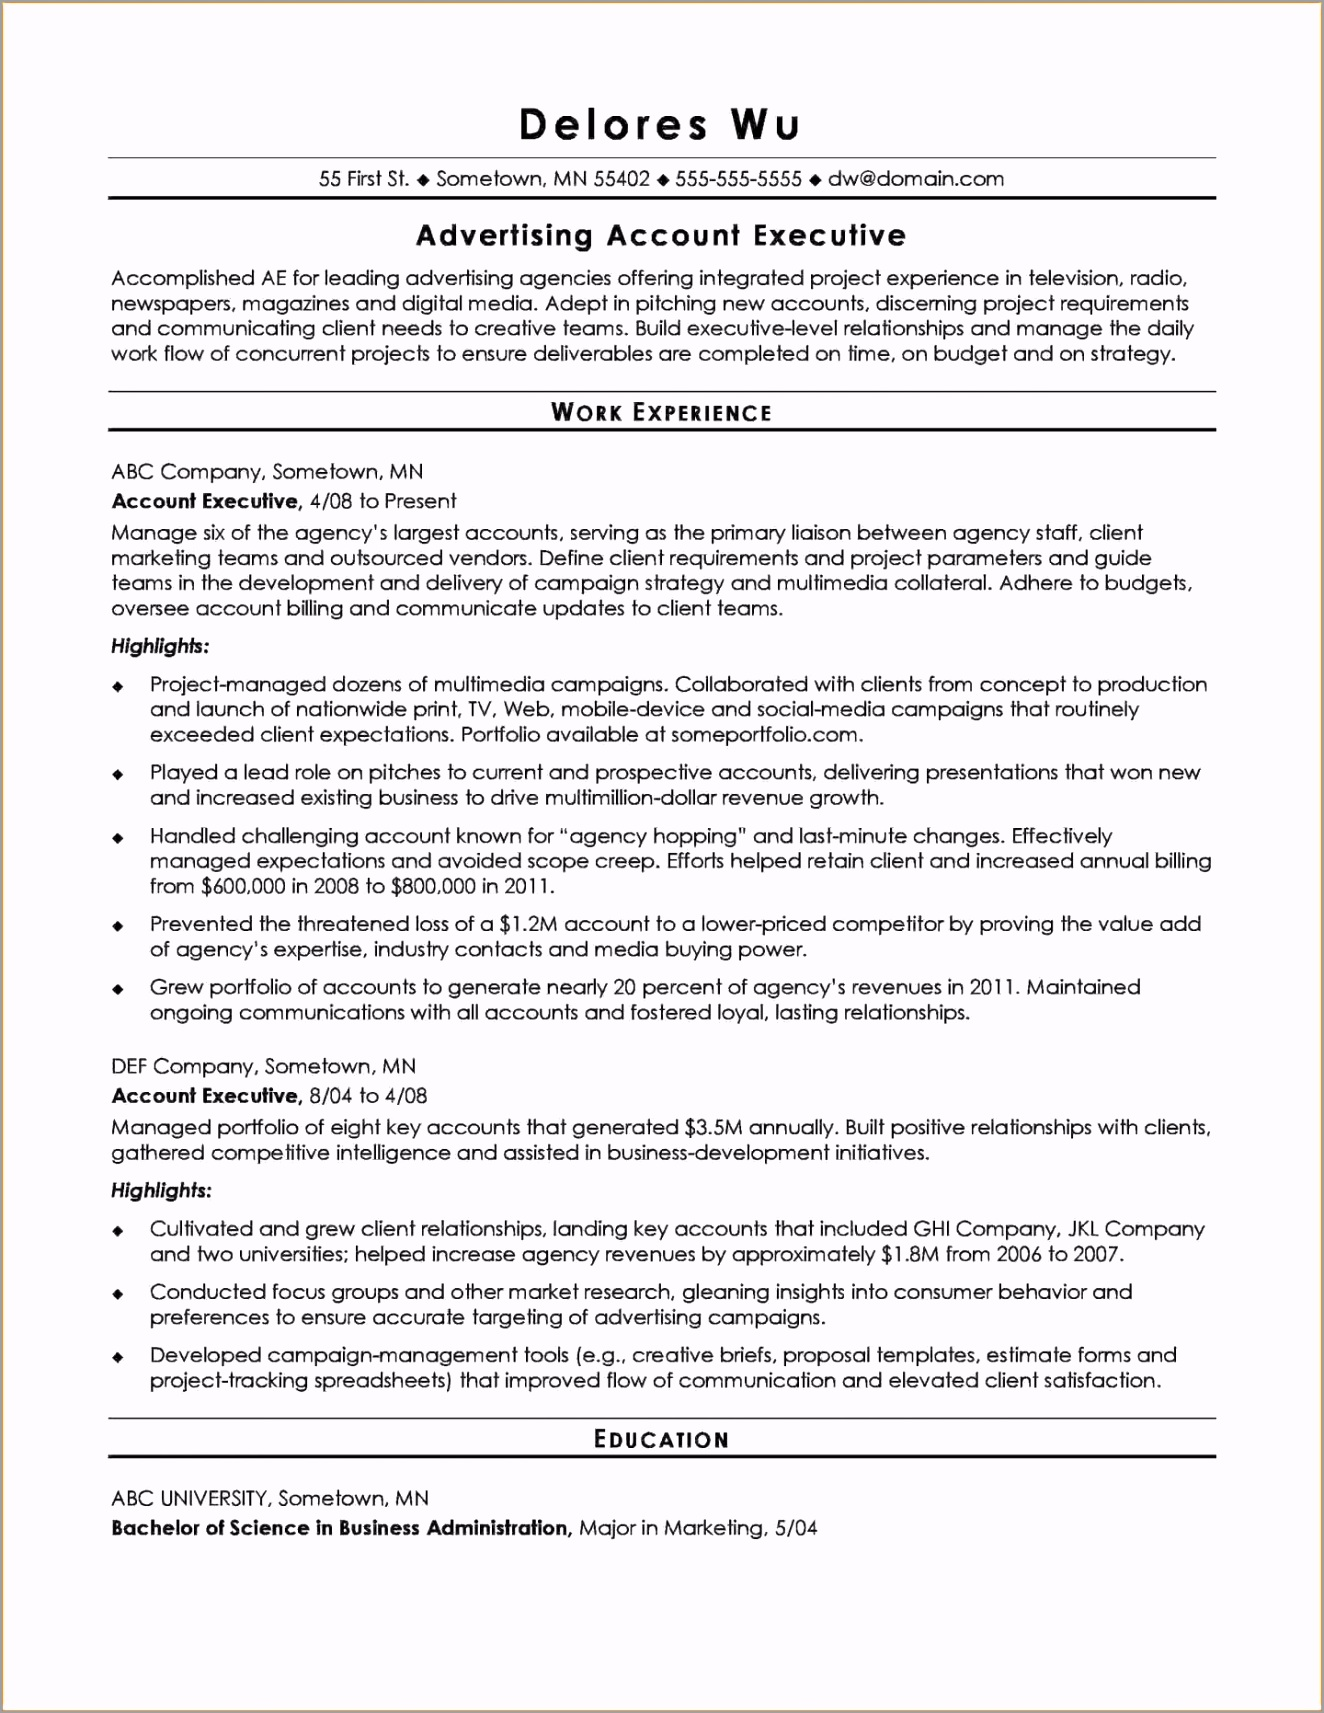 5ac7804b2c10d1c4e5428cb1 digital marketing contract template elegant radio advertising agreement template preview form contract of digital marketing contract template edoru